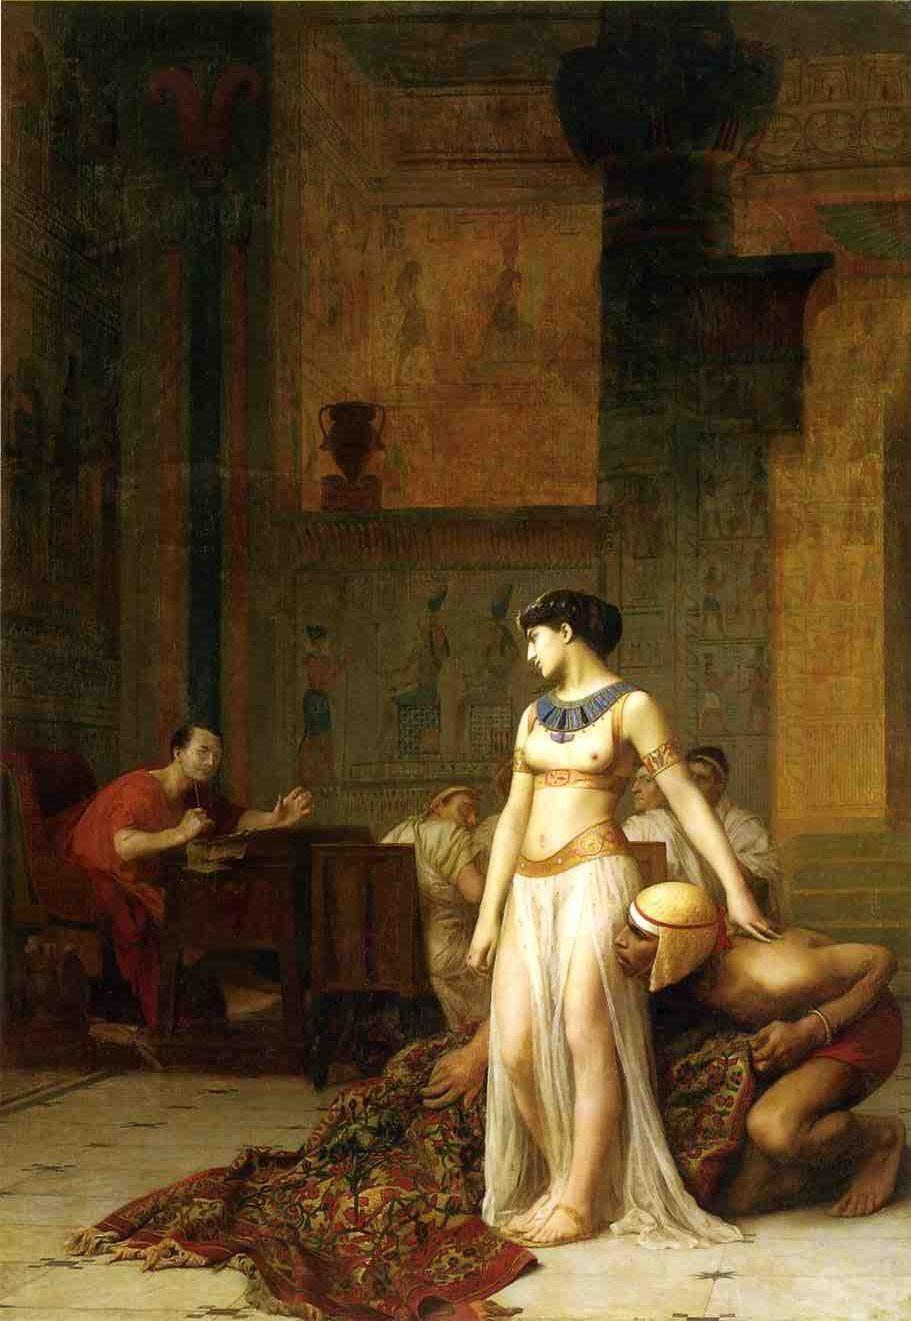 Jean-Leon-Gerome, Cleopatra and Caesar, 1866. Via Wikimedia Commons.